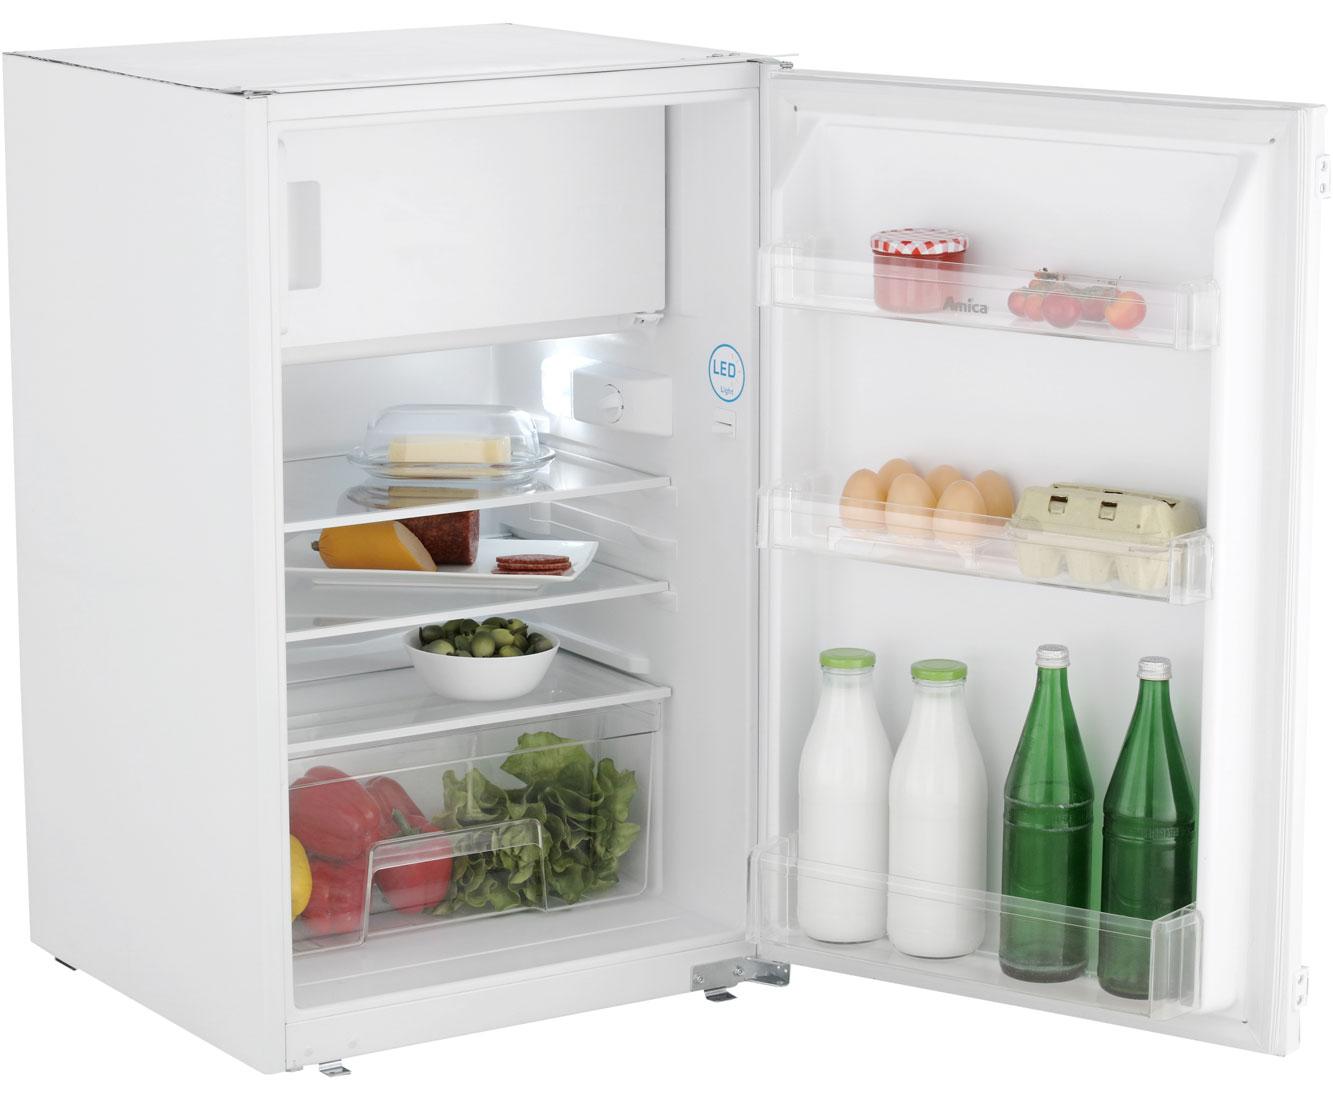 Bomann Kühlschrank Dt 248 : Kühlschrank einstellen 1 5 kühlschrank modelle